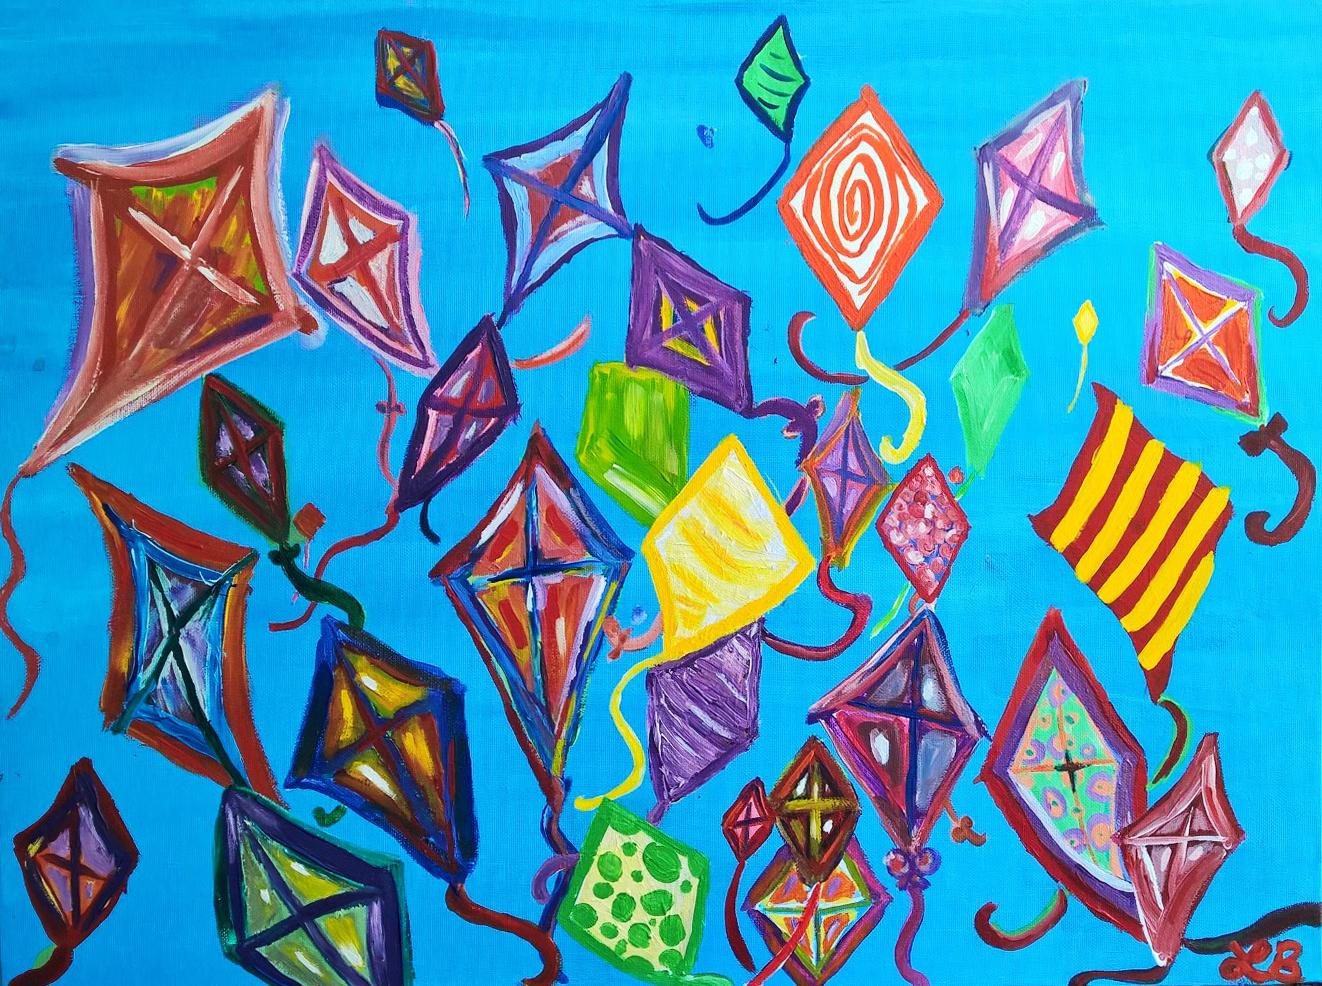 myriad-kites-colorful